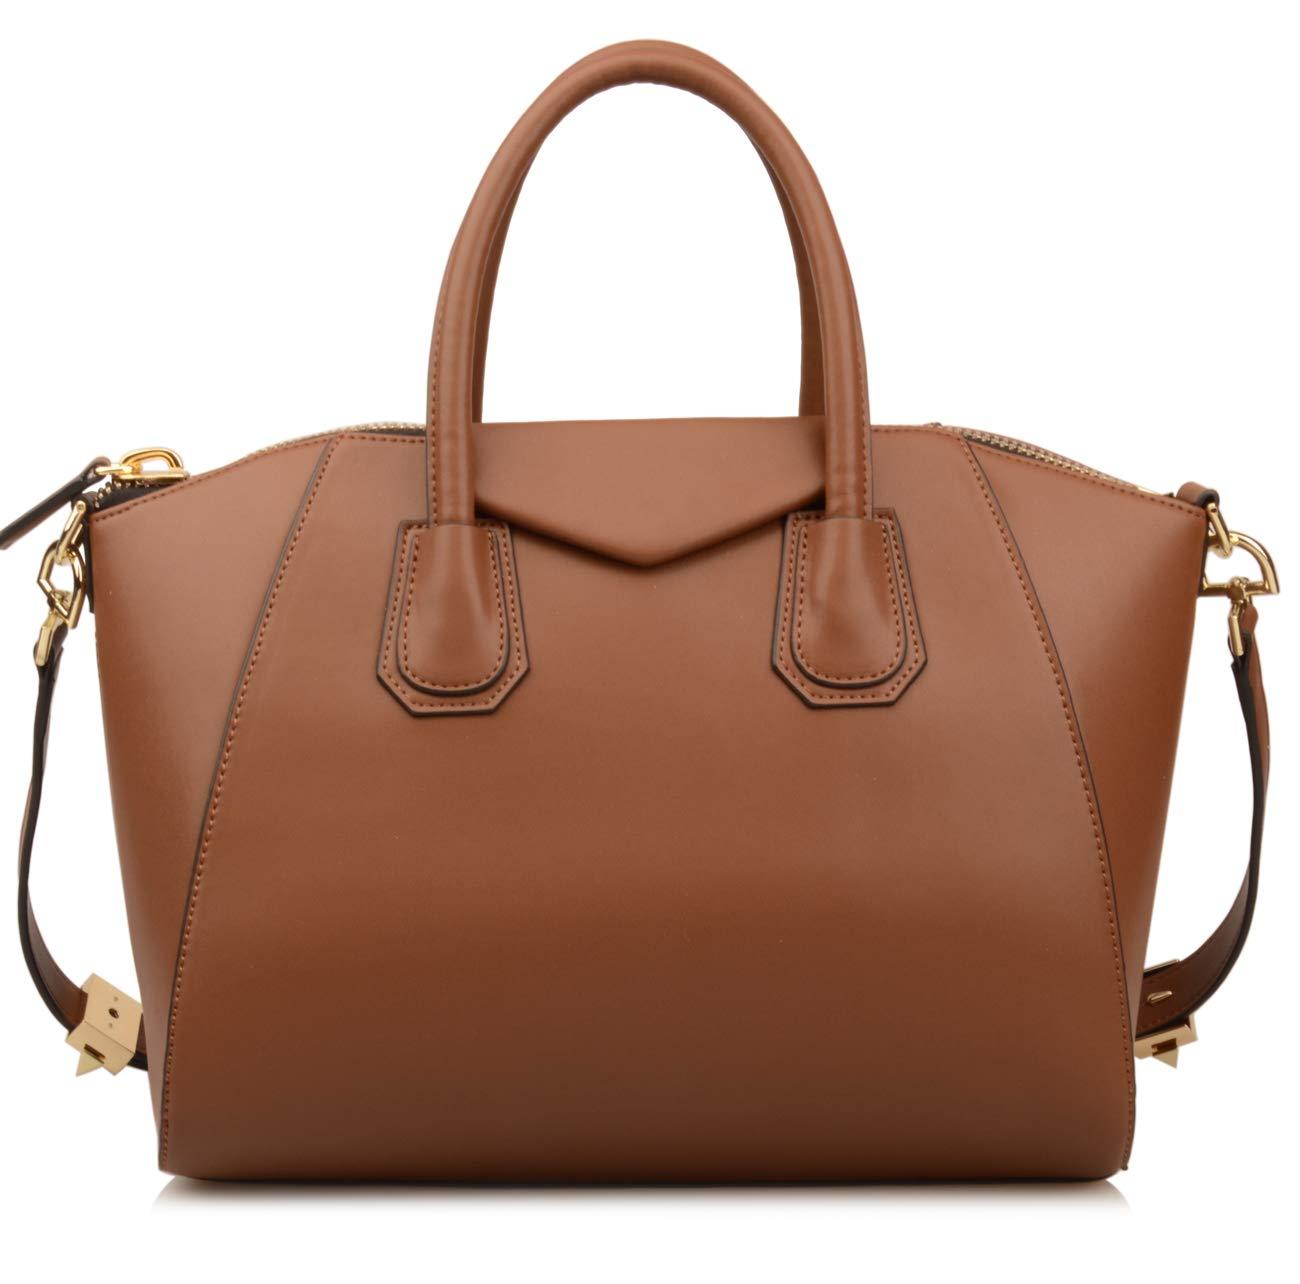 Ainifeel Women's Genuine Leather Everyday Purse Top Handle Handbags Shoulder Bags (Medium, Khaki)